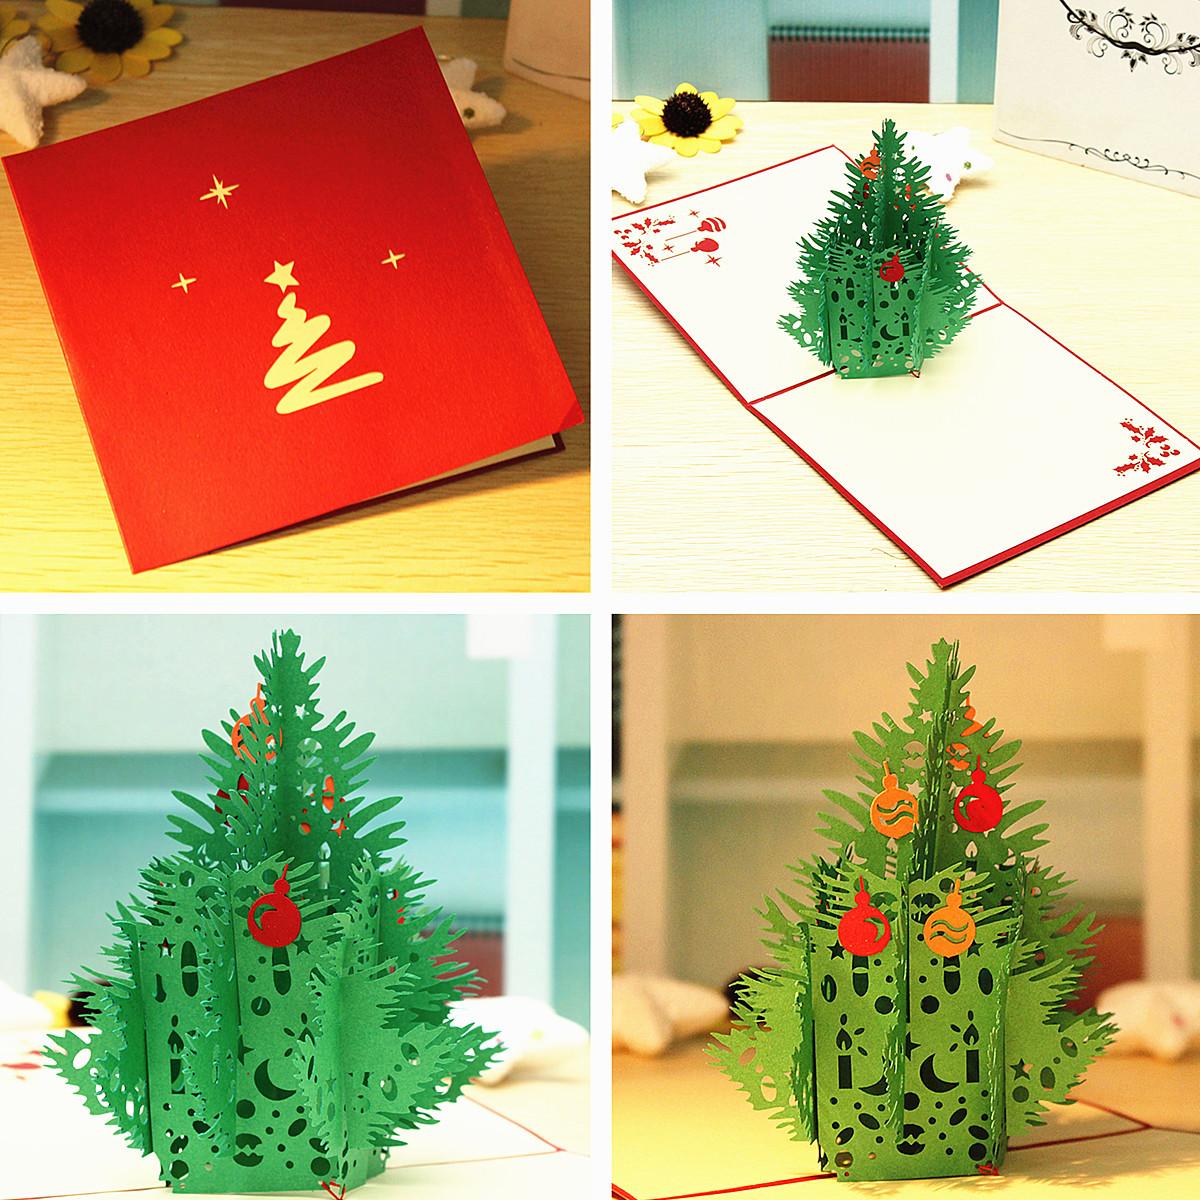 Christmas tree birthday handmade 3d greeting card for 3d xmas cards to make